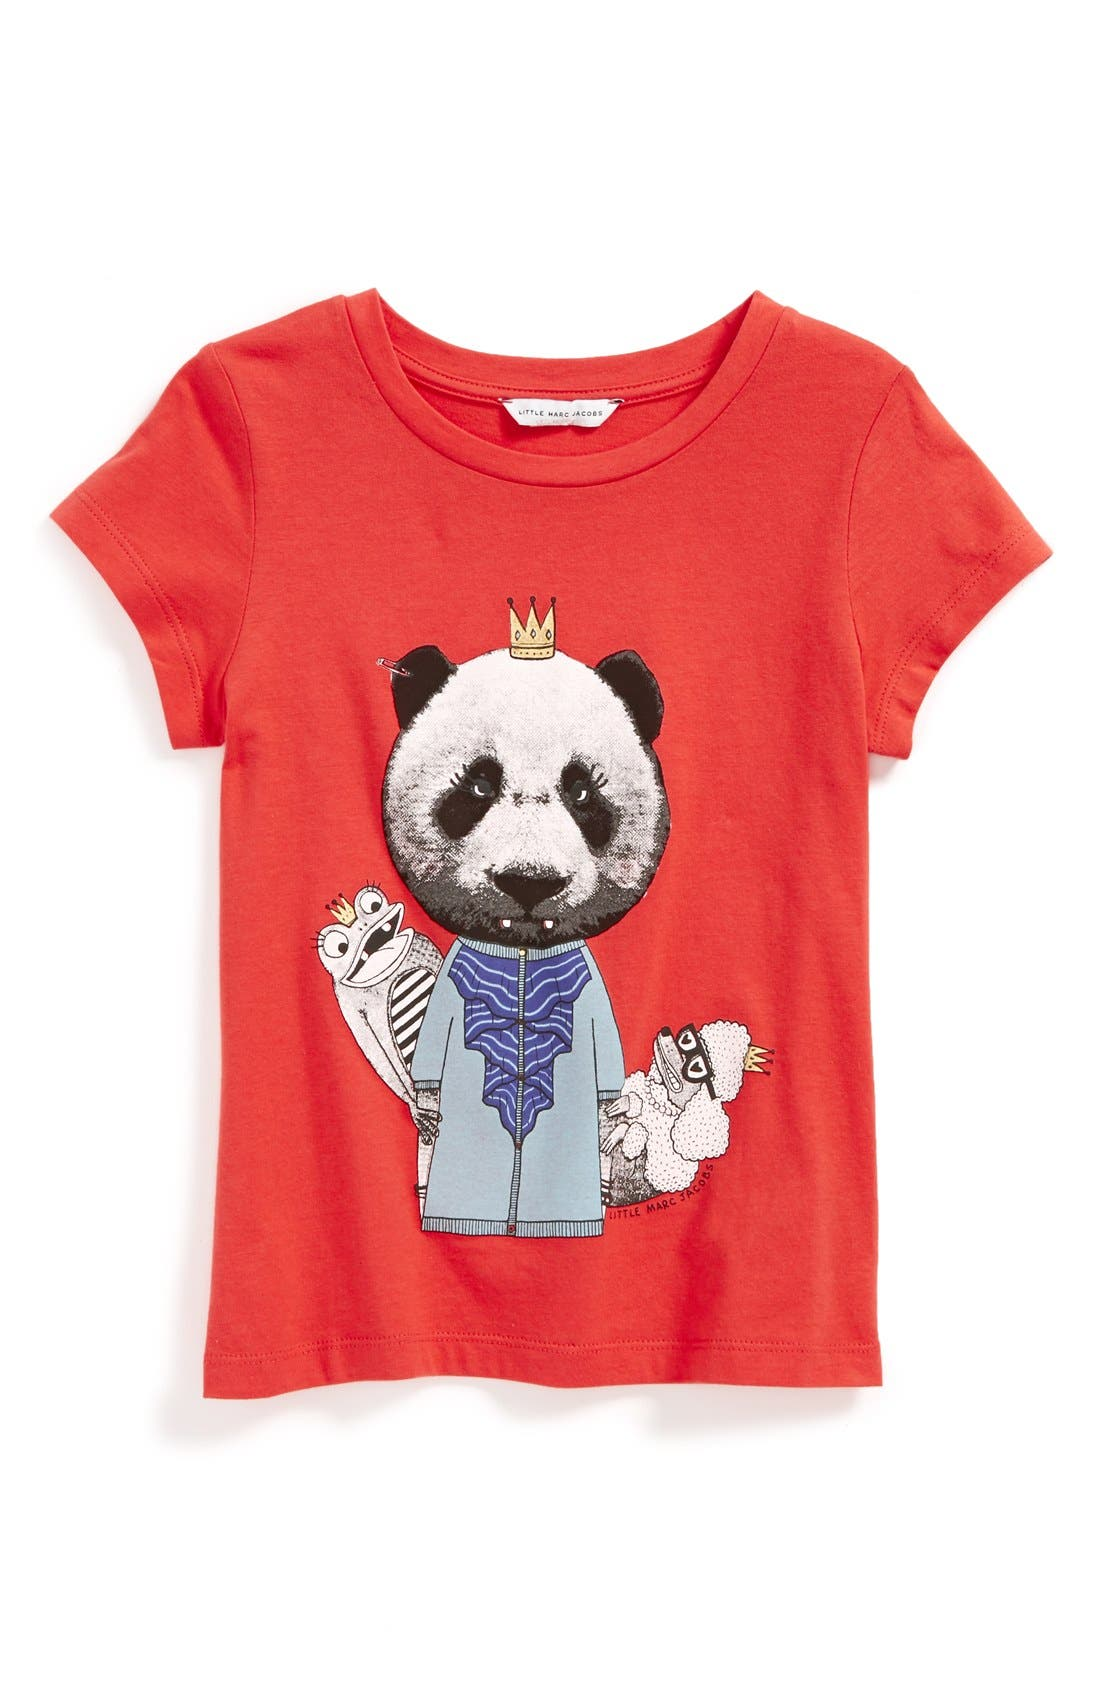 Alternate Image 1 Selected - LITTLE MARC JACOBS 'Panda' Cotton & Modal Tee (Little Girls & Big Girls)